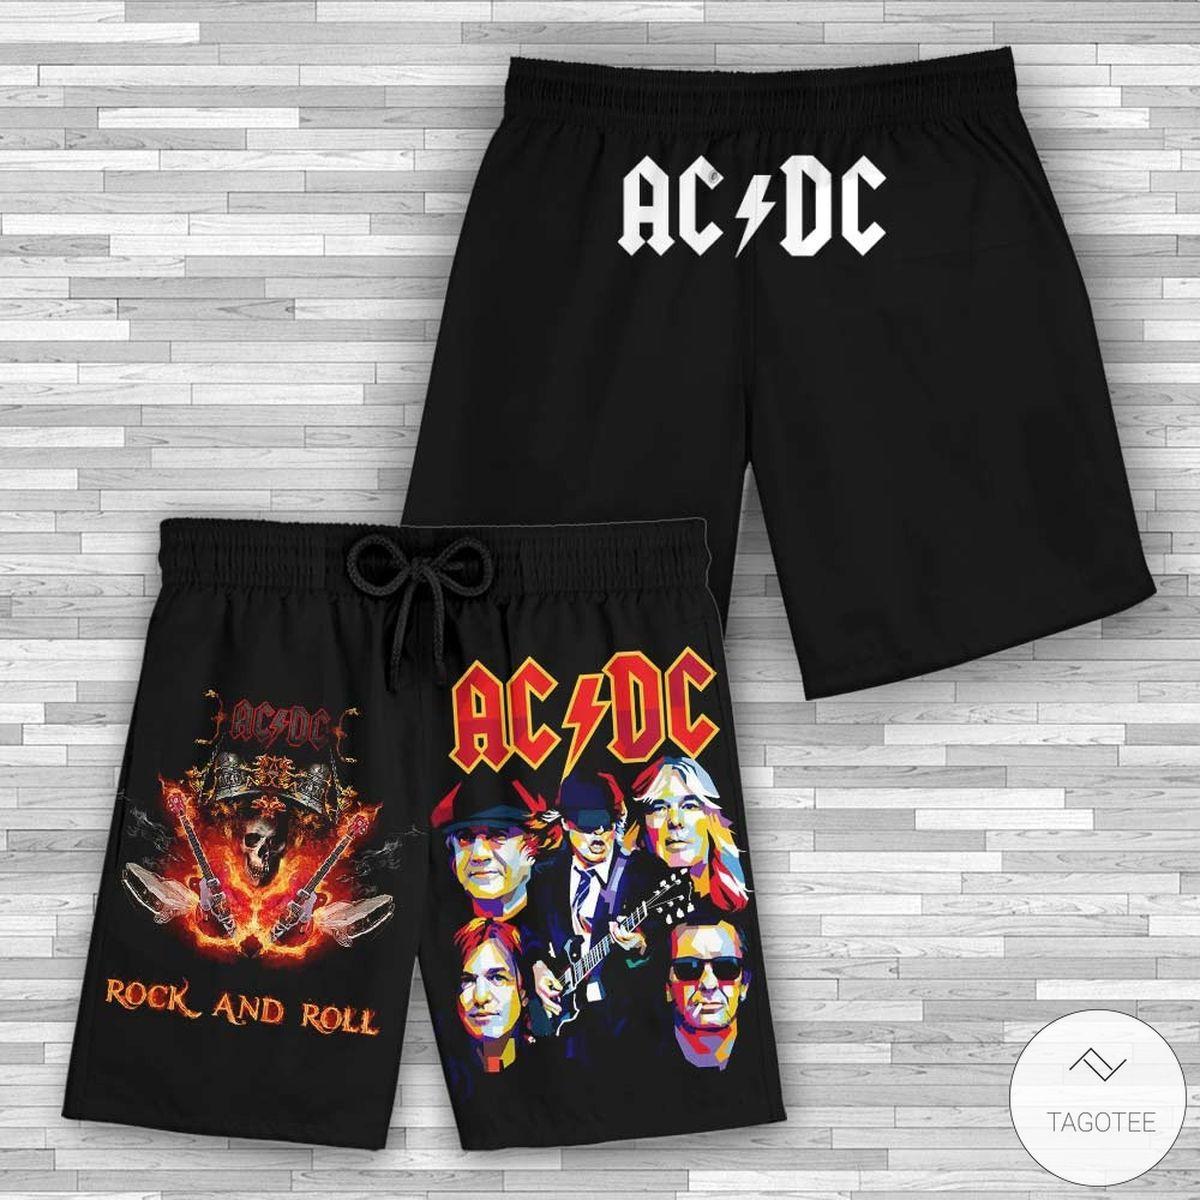 ACDC Short